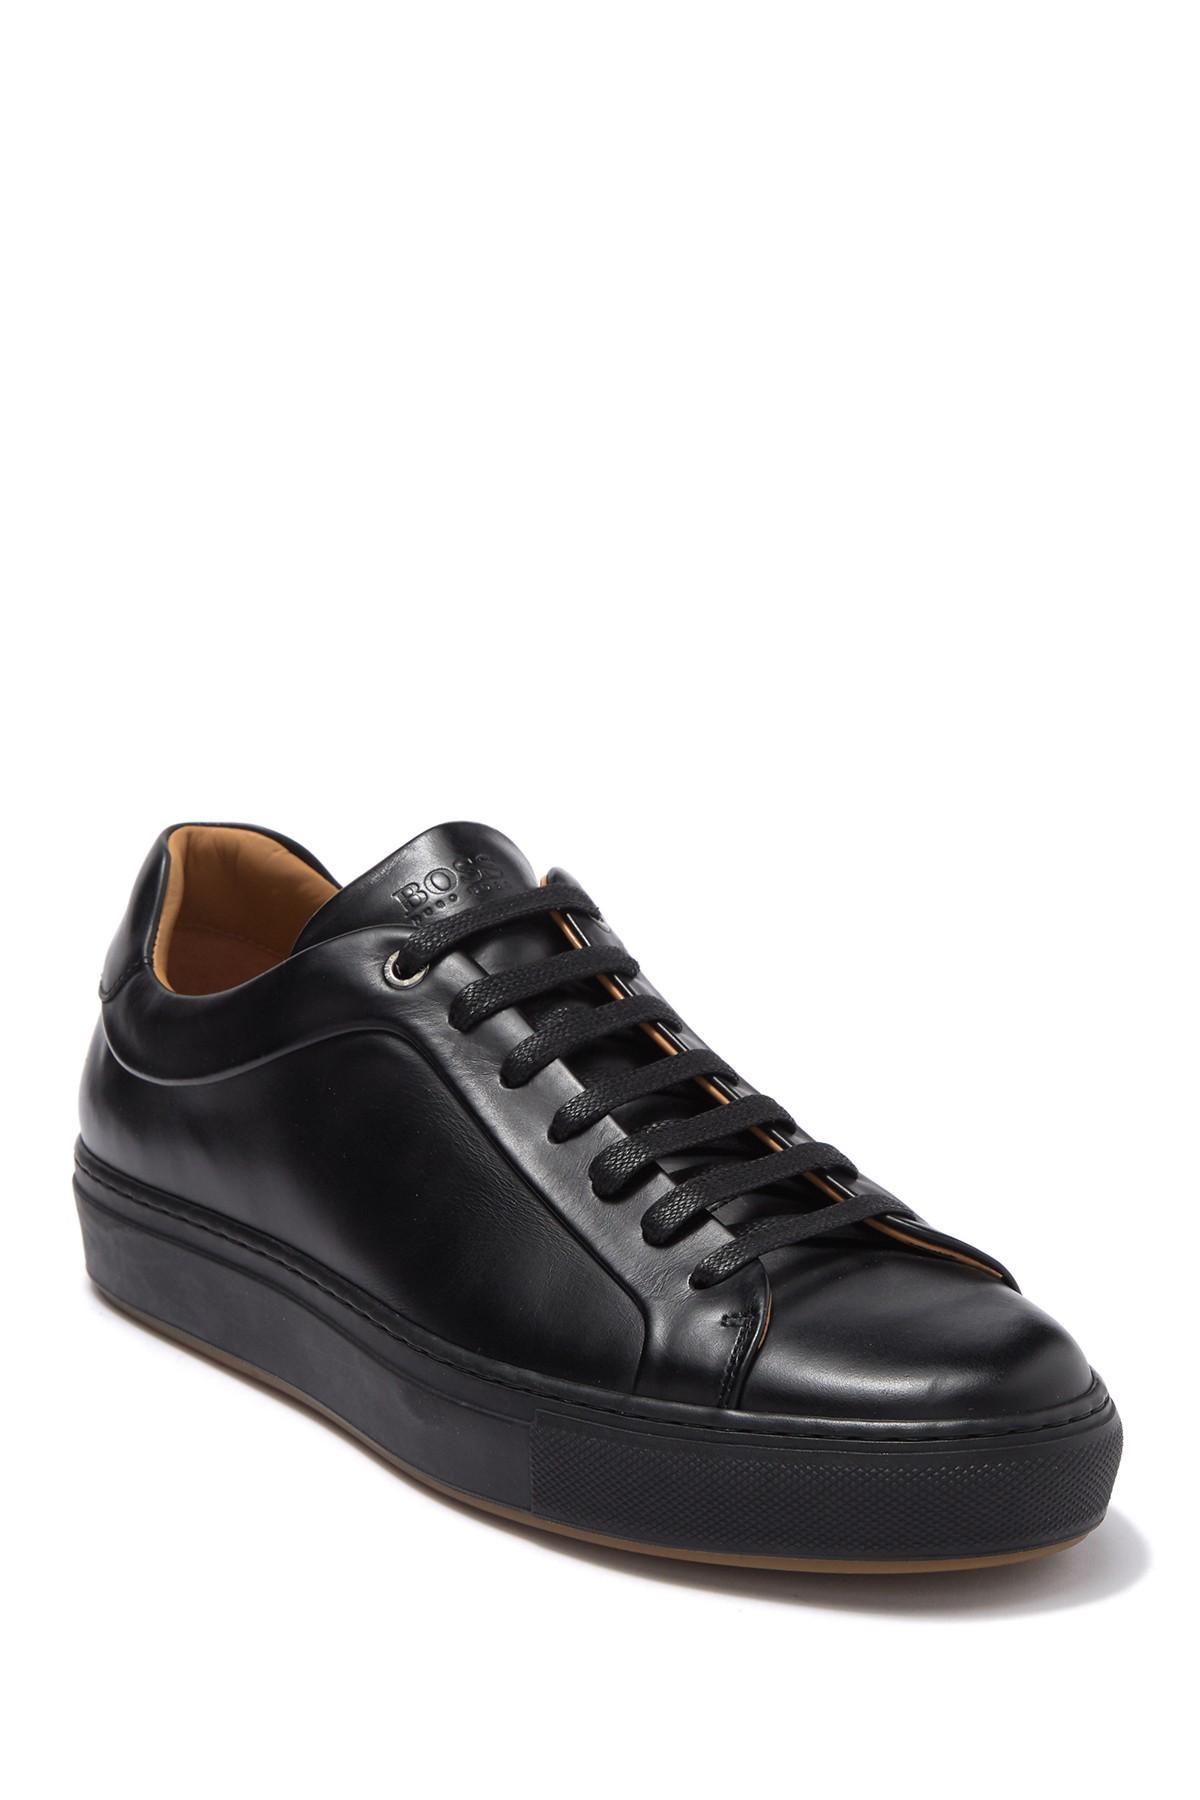 Hugo Boss Mirage Tennis Leather Sneaker